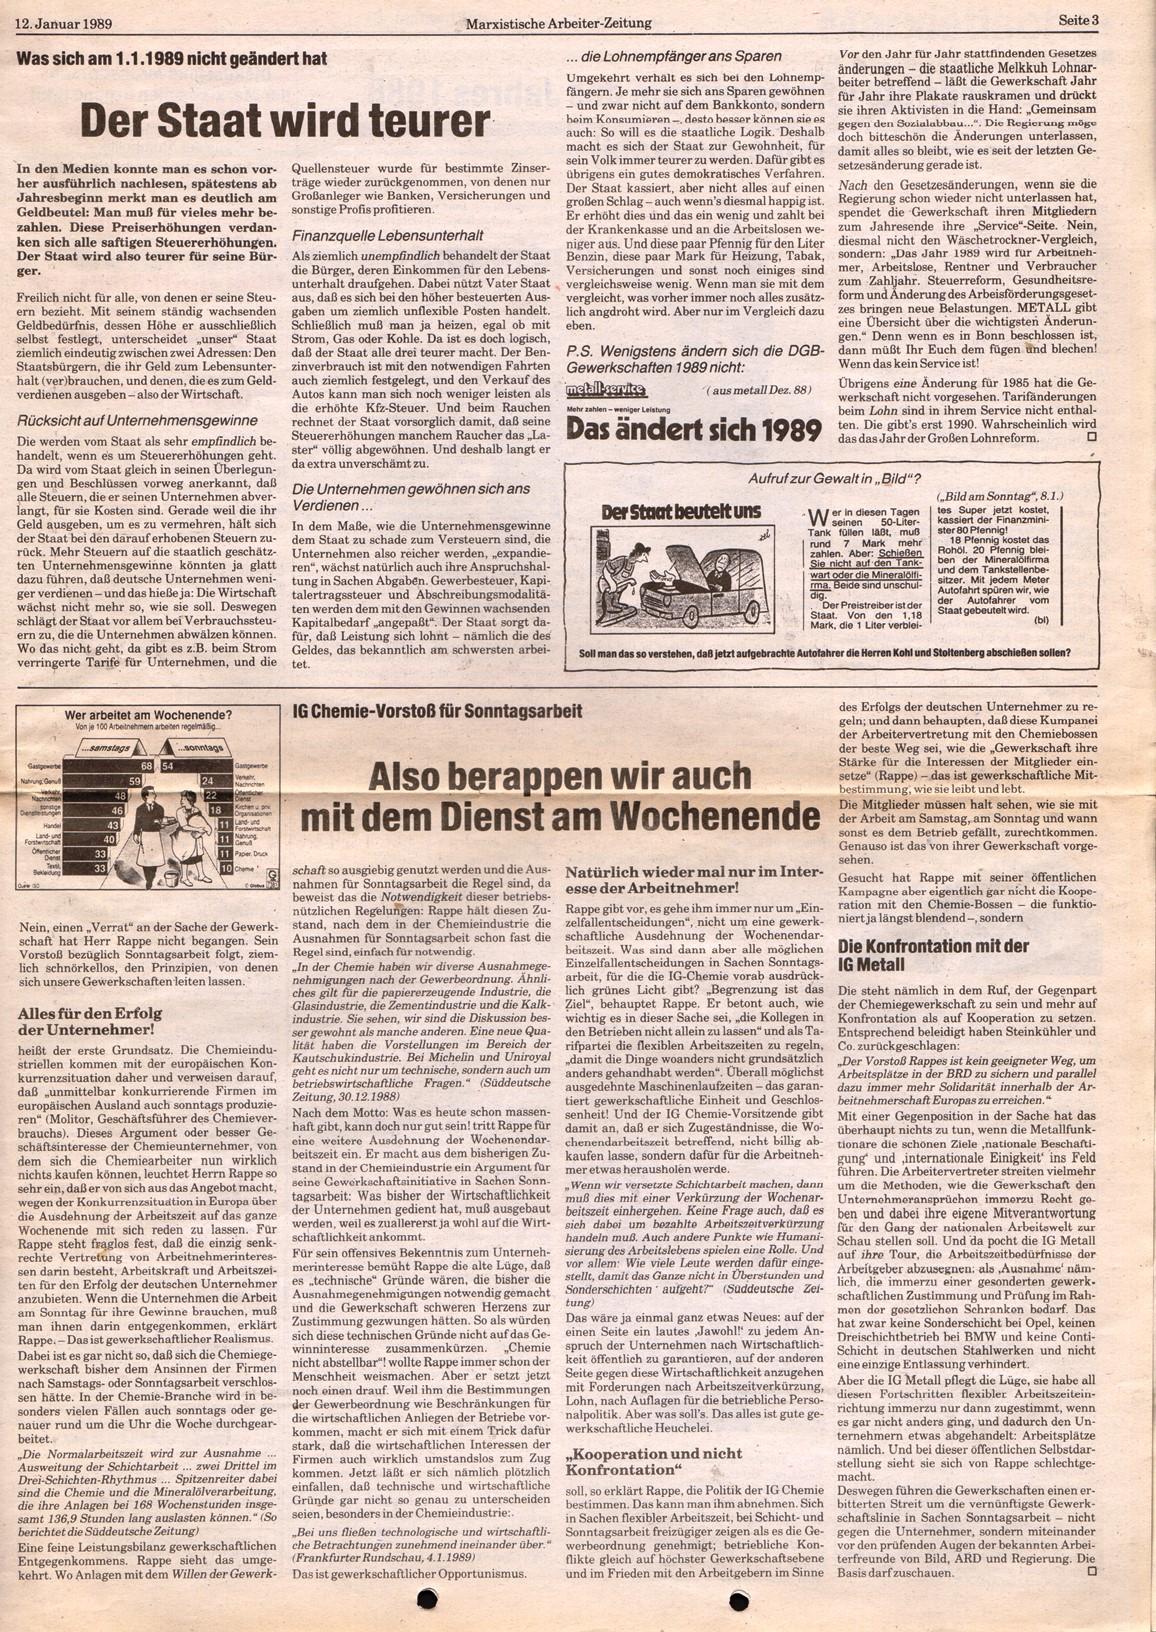 Muenchen_MG_MAZ_19890112_03